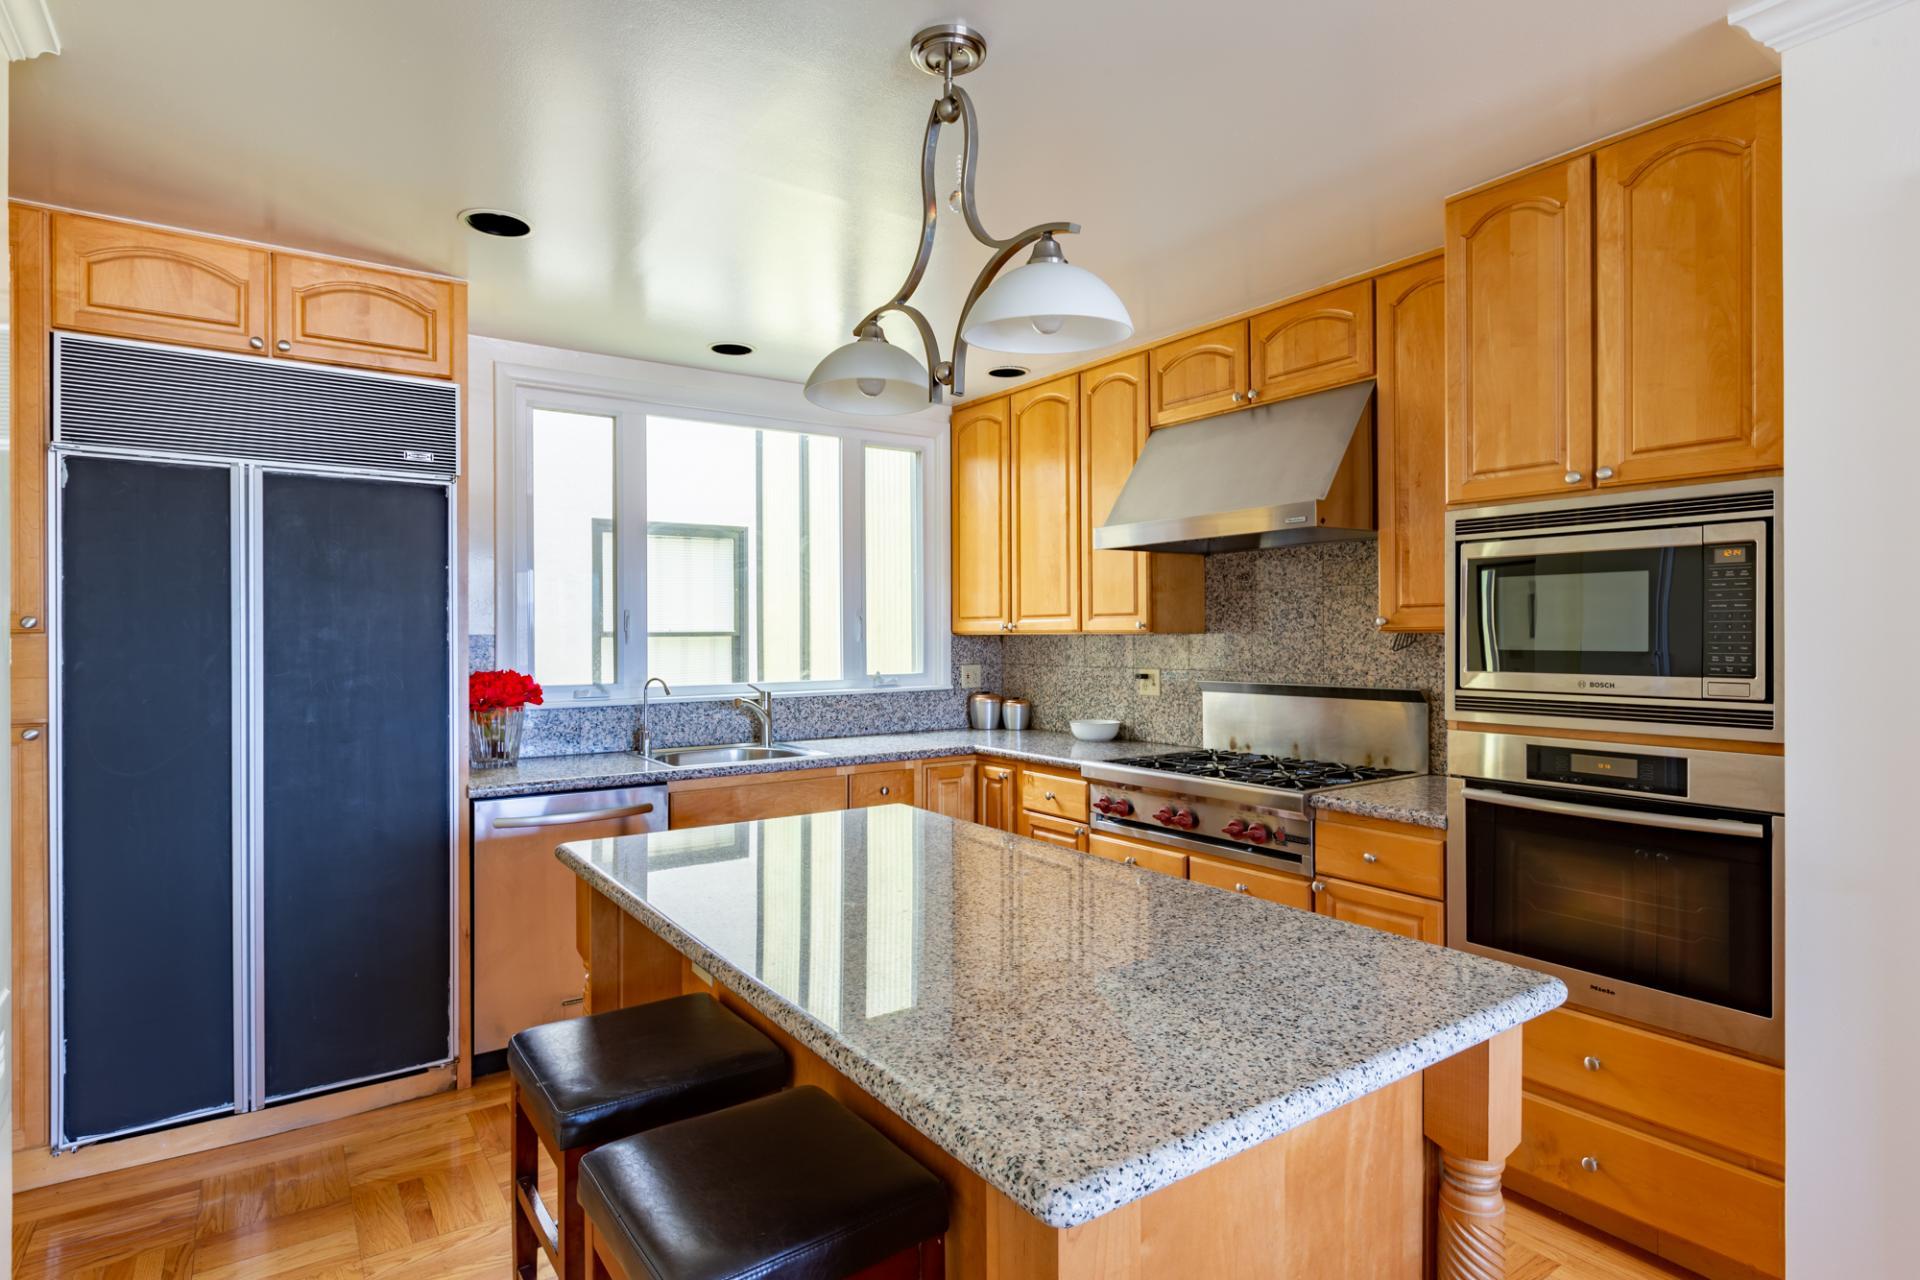 Kitchen at Leavenworth Street Apartment, Russian Hill, San Francisco